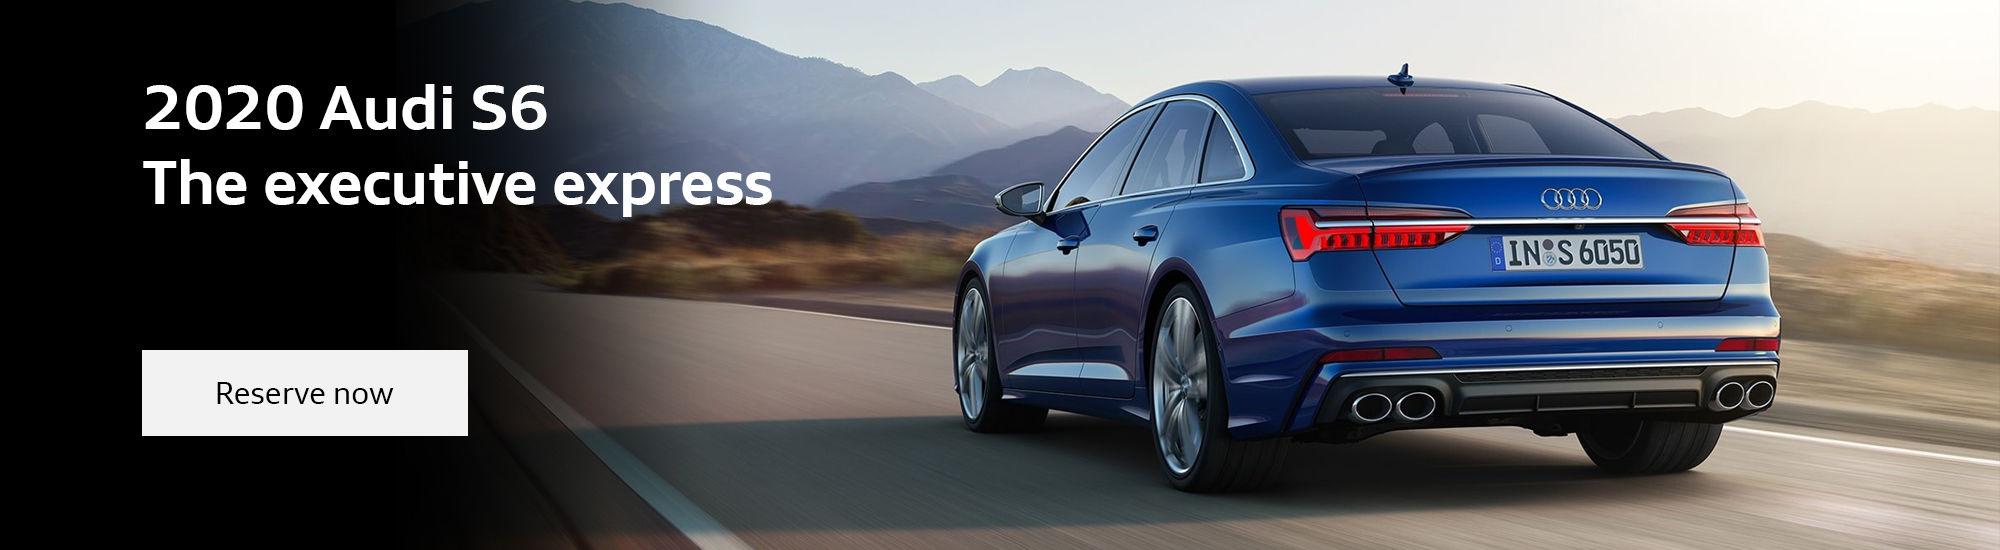 The all-new 2020 Audi S6 sedan